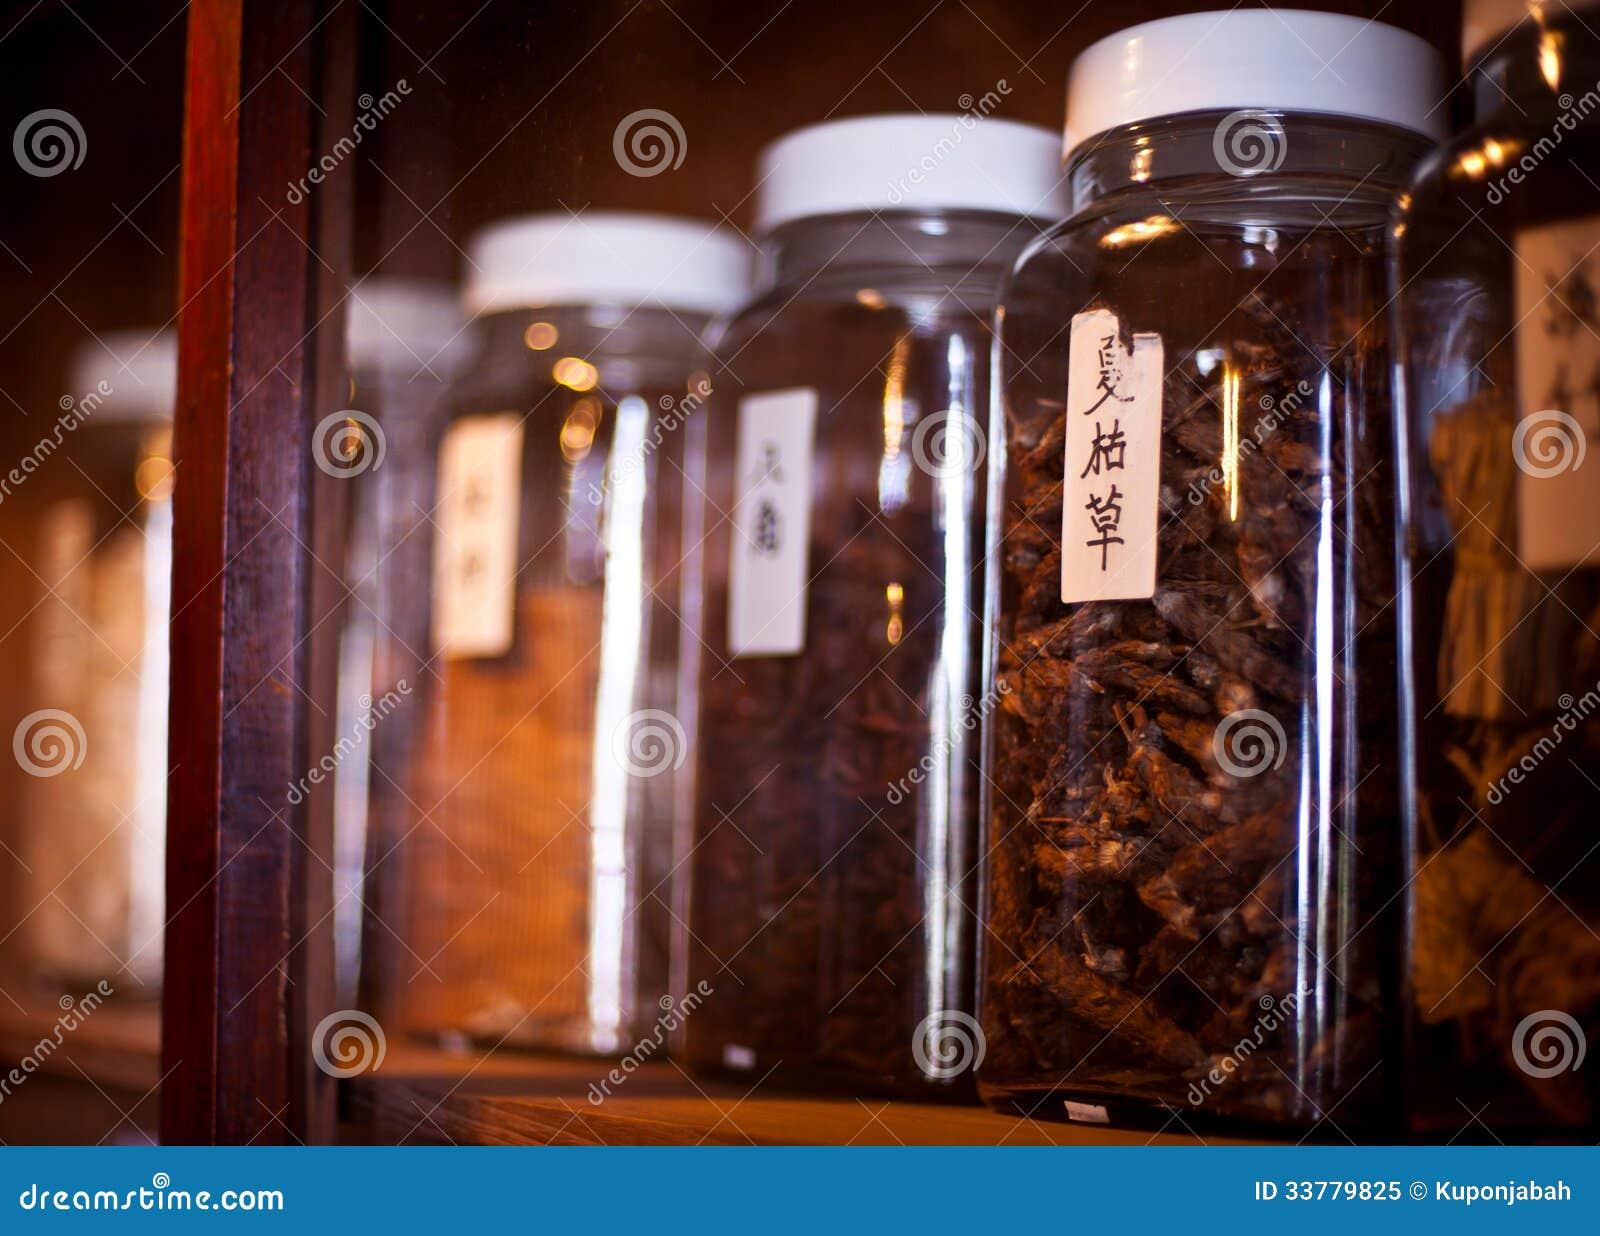 chines herbal patent medicines pdf